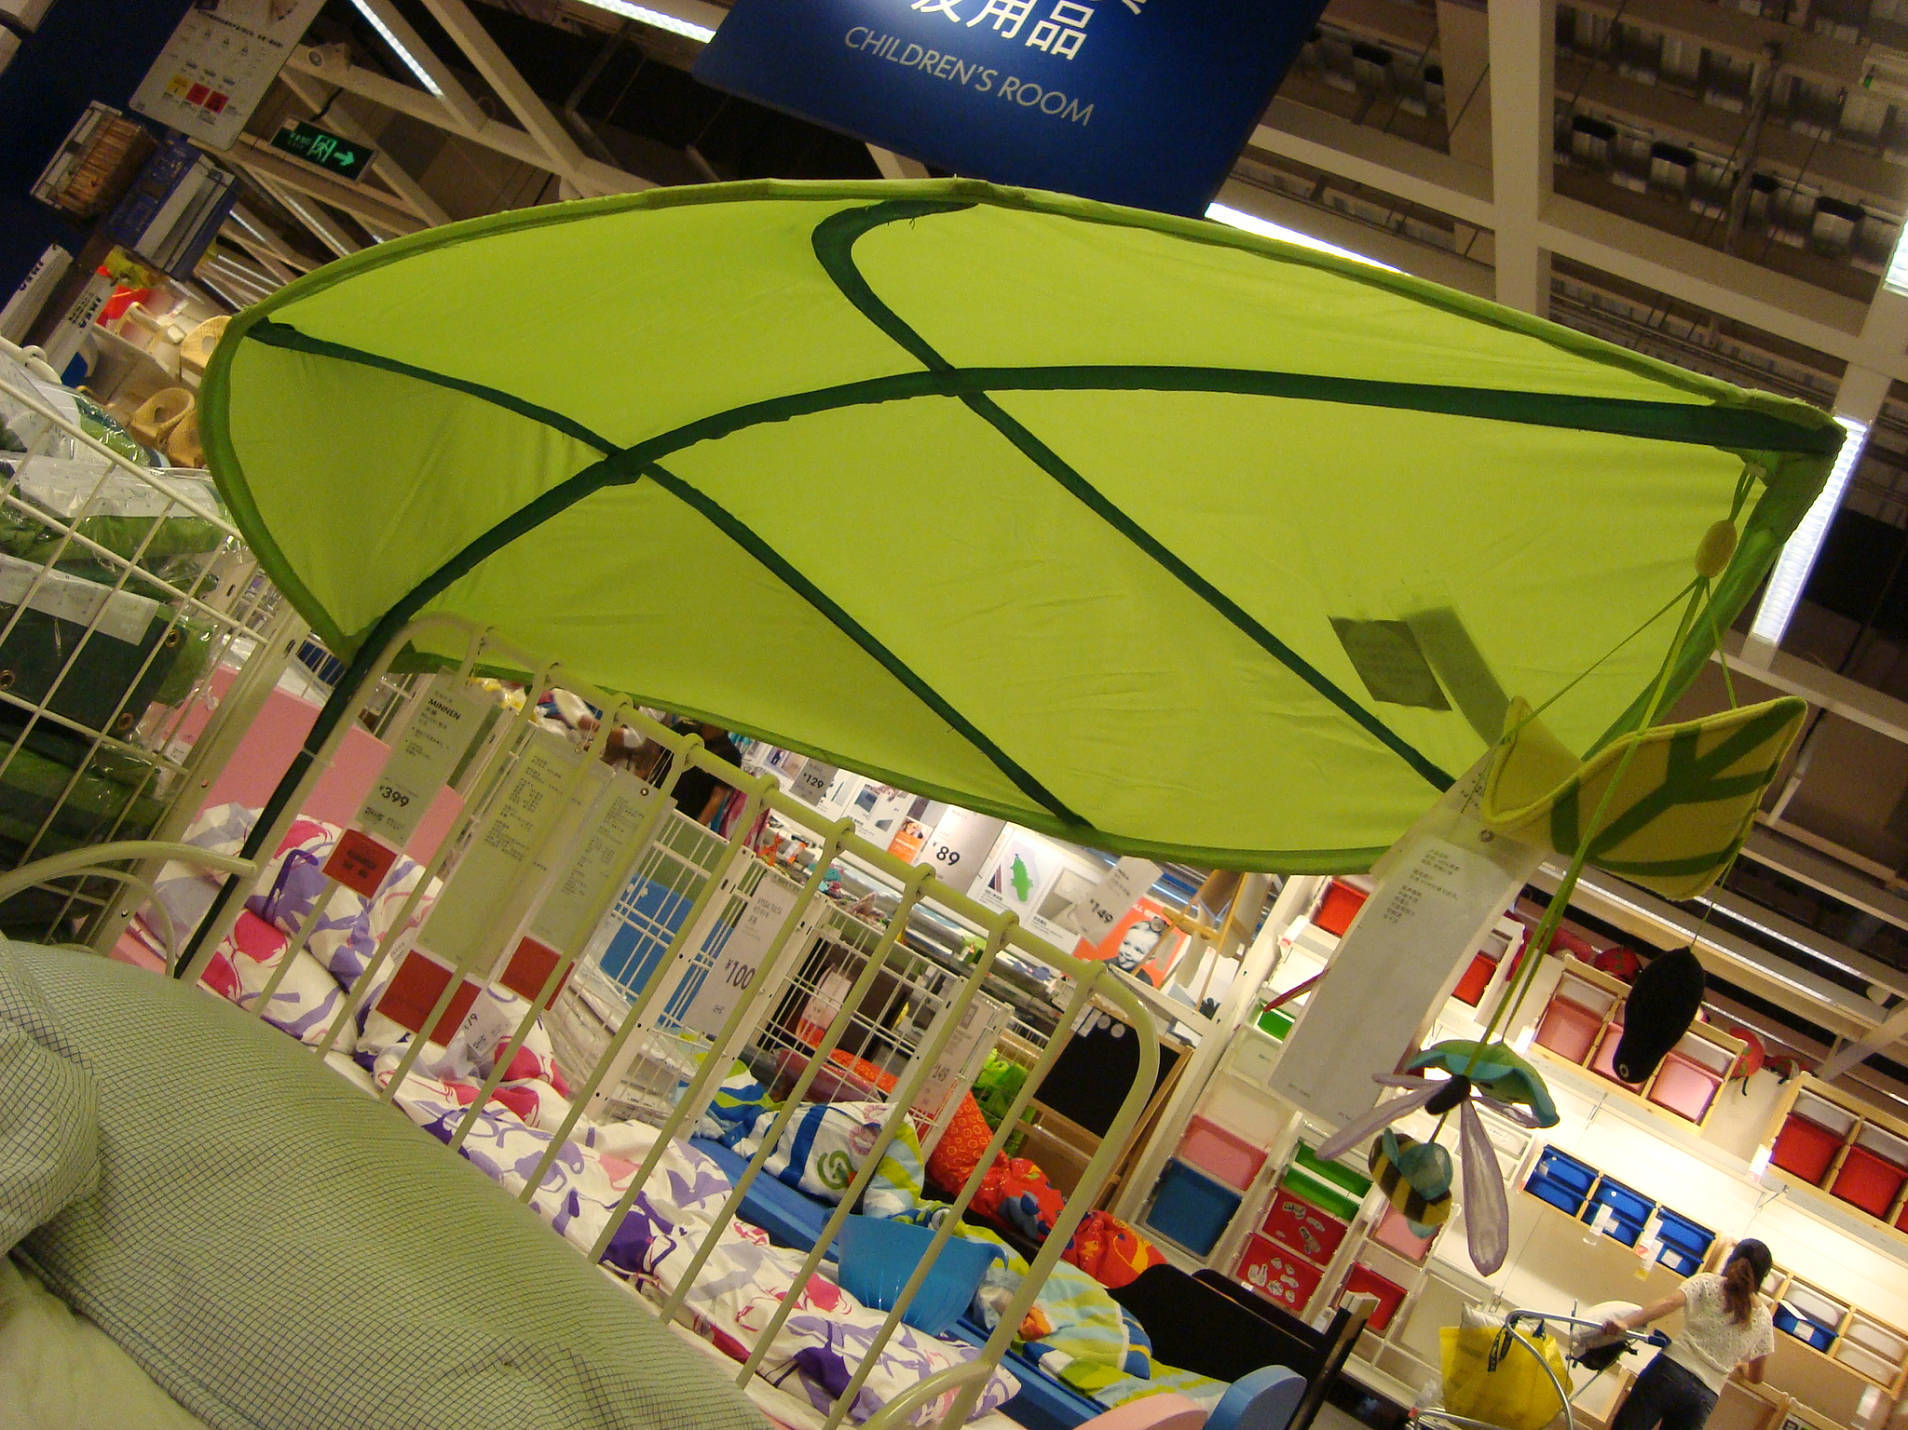 детский текстиль IKEA Покупка Зеленый кровати балдахин ребенка Балдахин для кровати